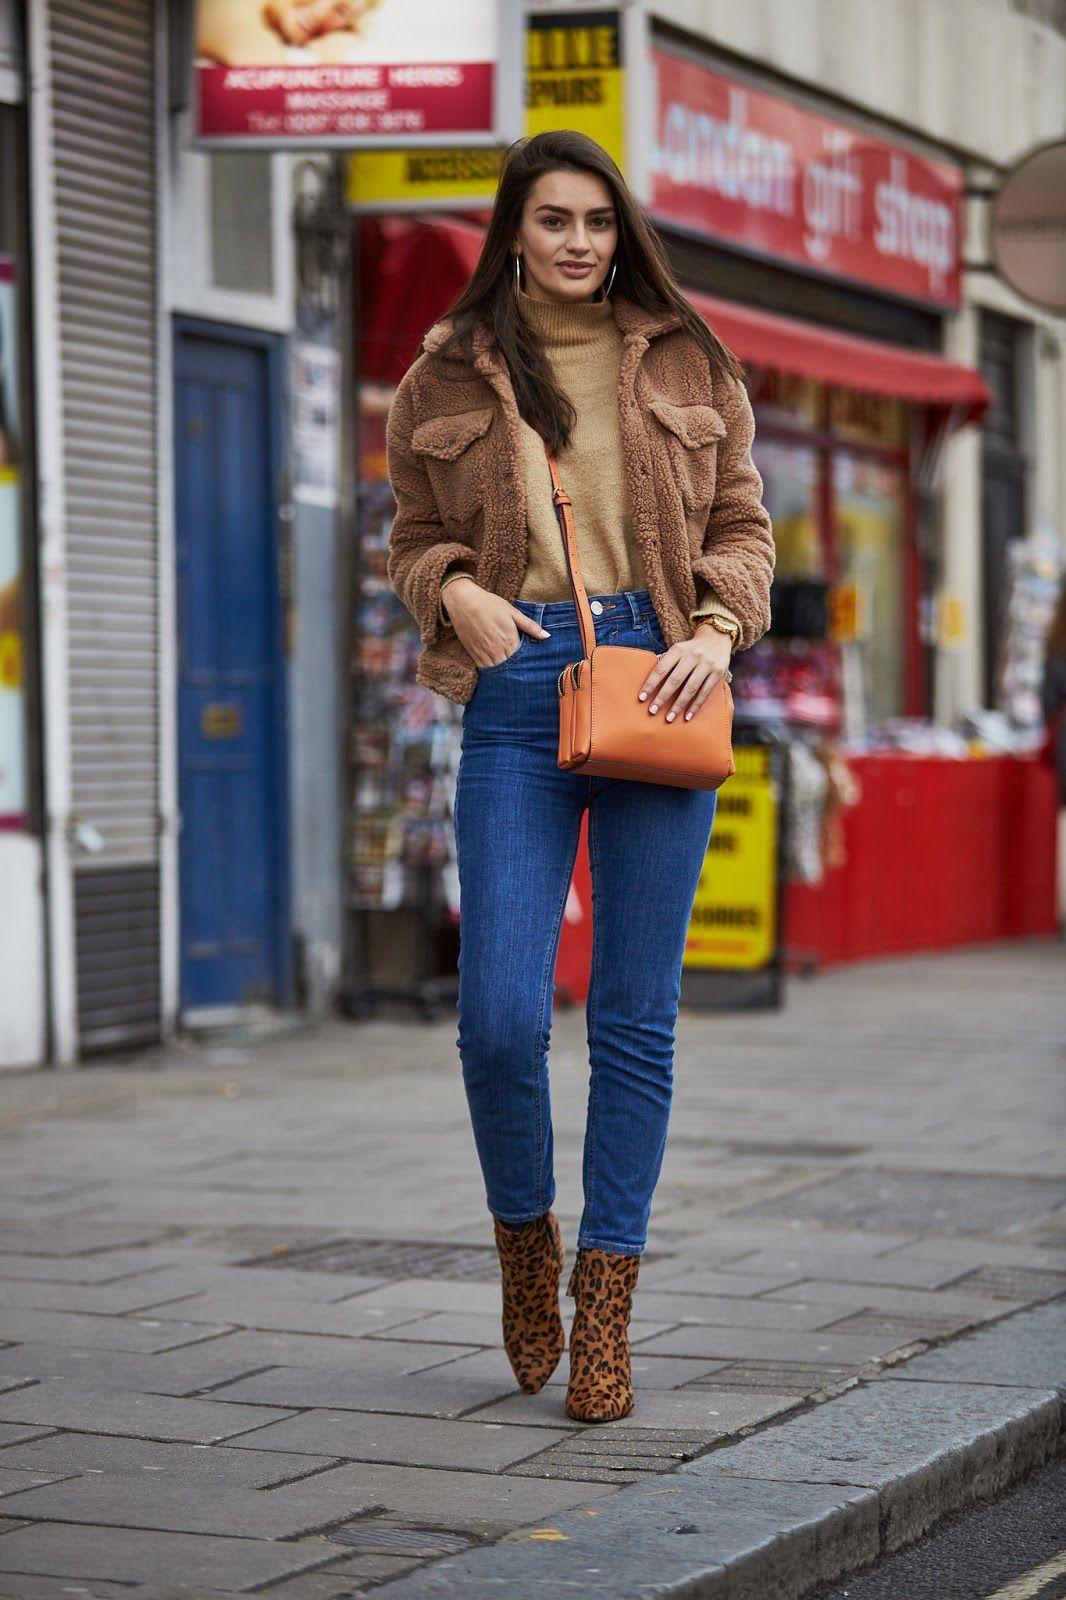 4ebb2b05a517 ankle boots asos crossbody bag farleigh fashion fiorelli leopard print lfw  missguided mom jeans roll neck teddy bear topshop winter